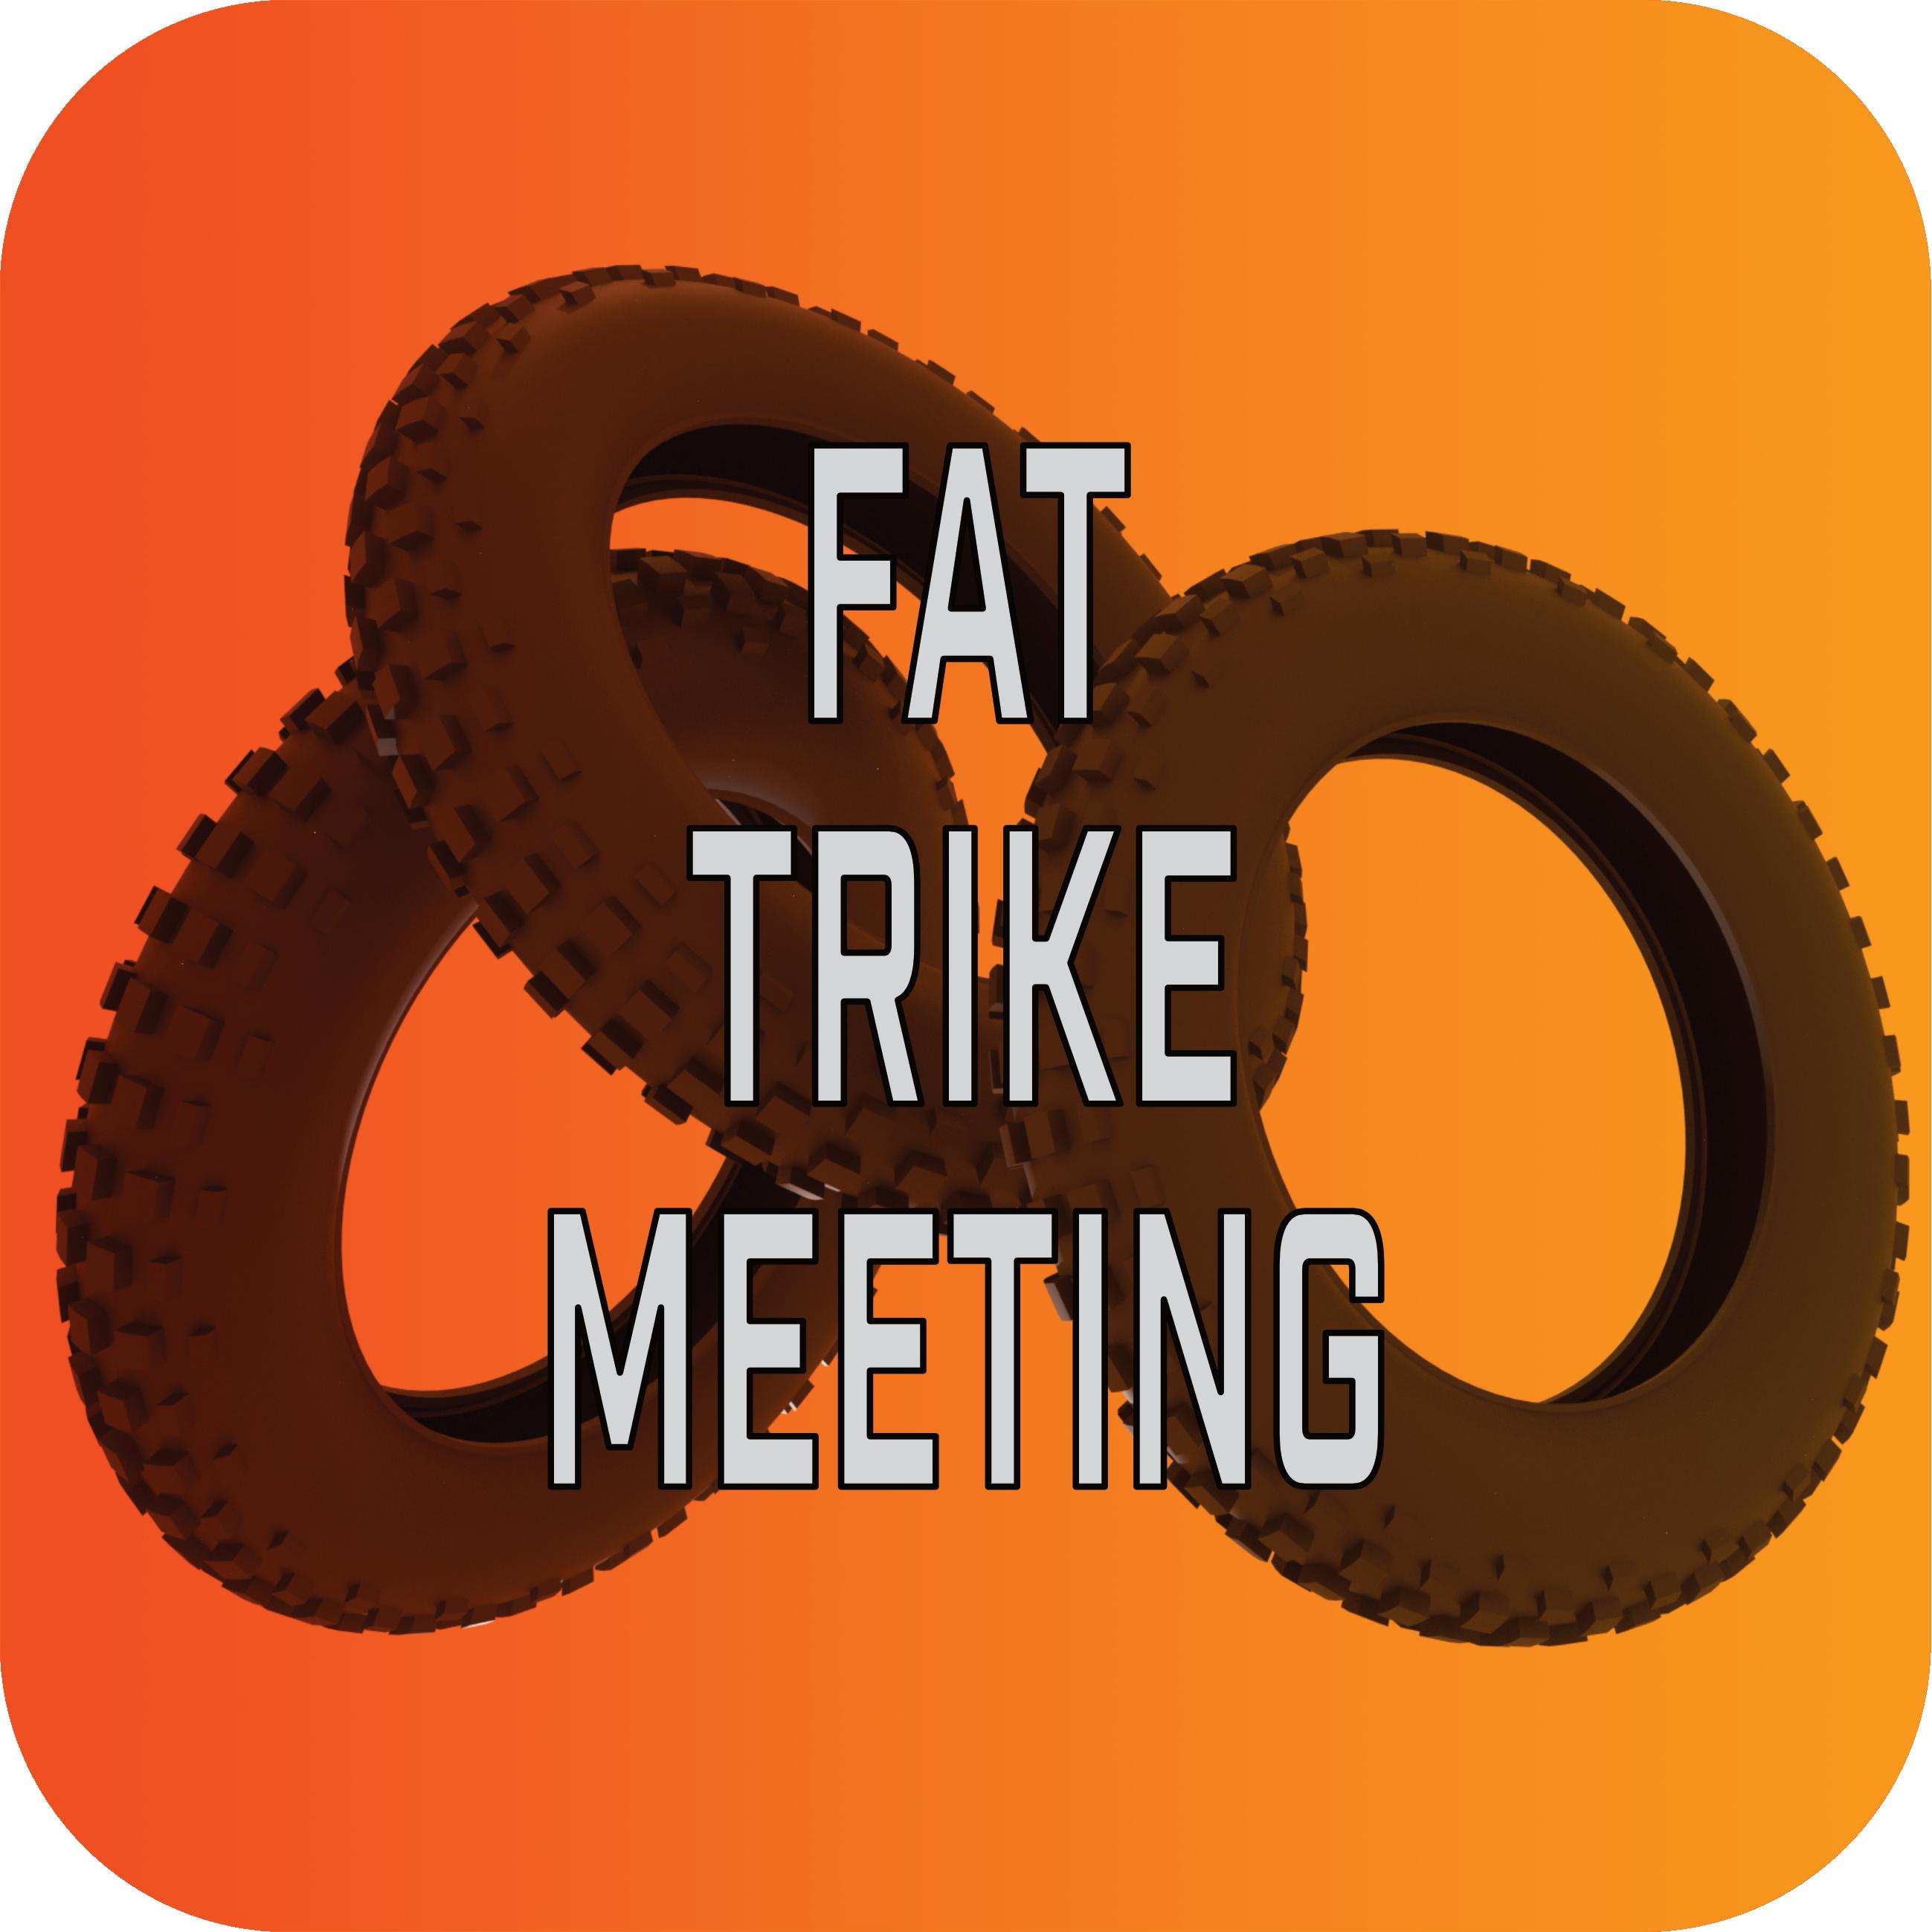 Fat-Trike-Meeting